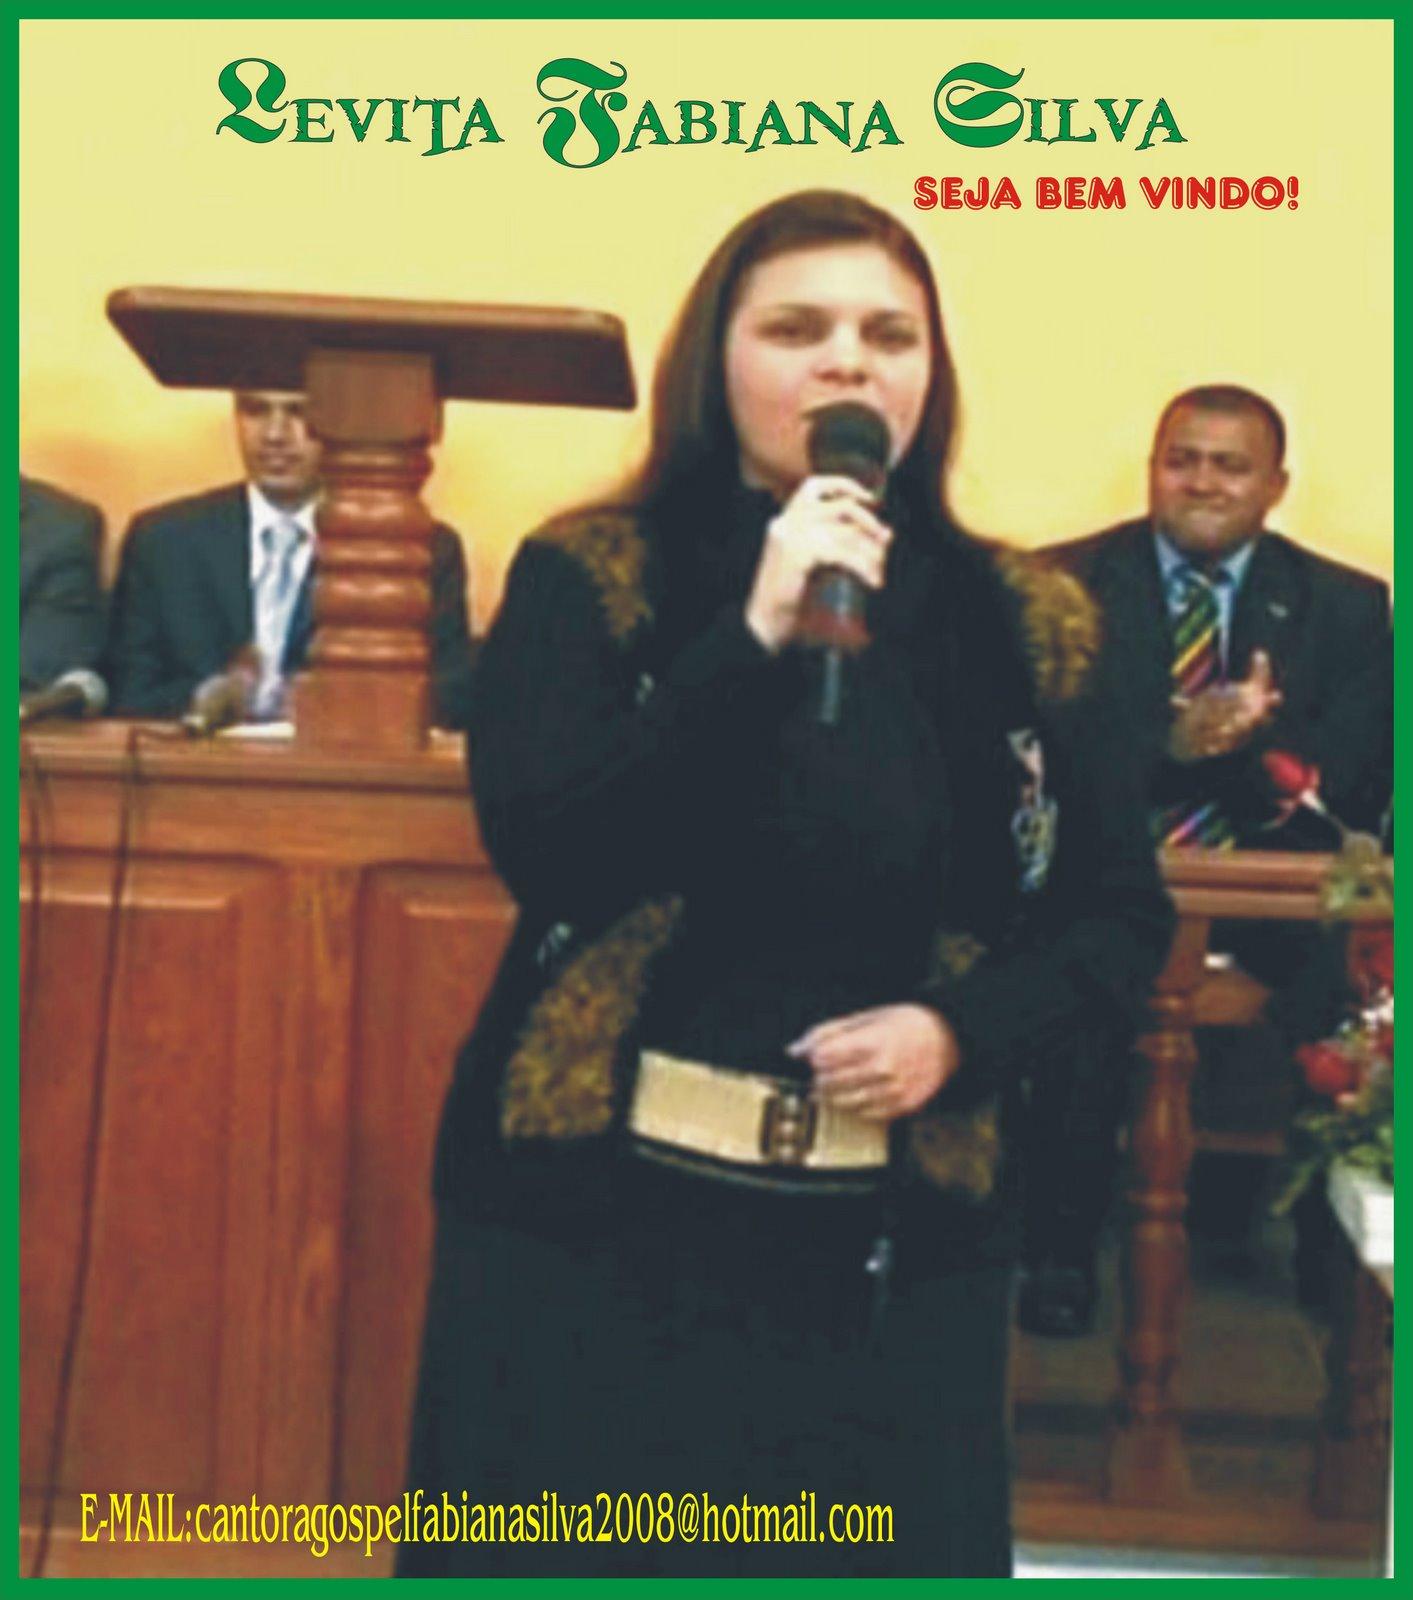 LEVITA FABIANA SILVA